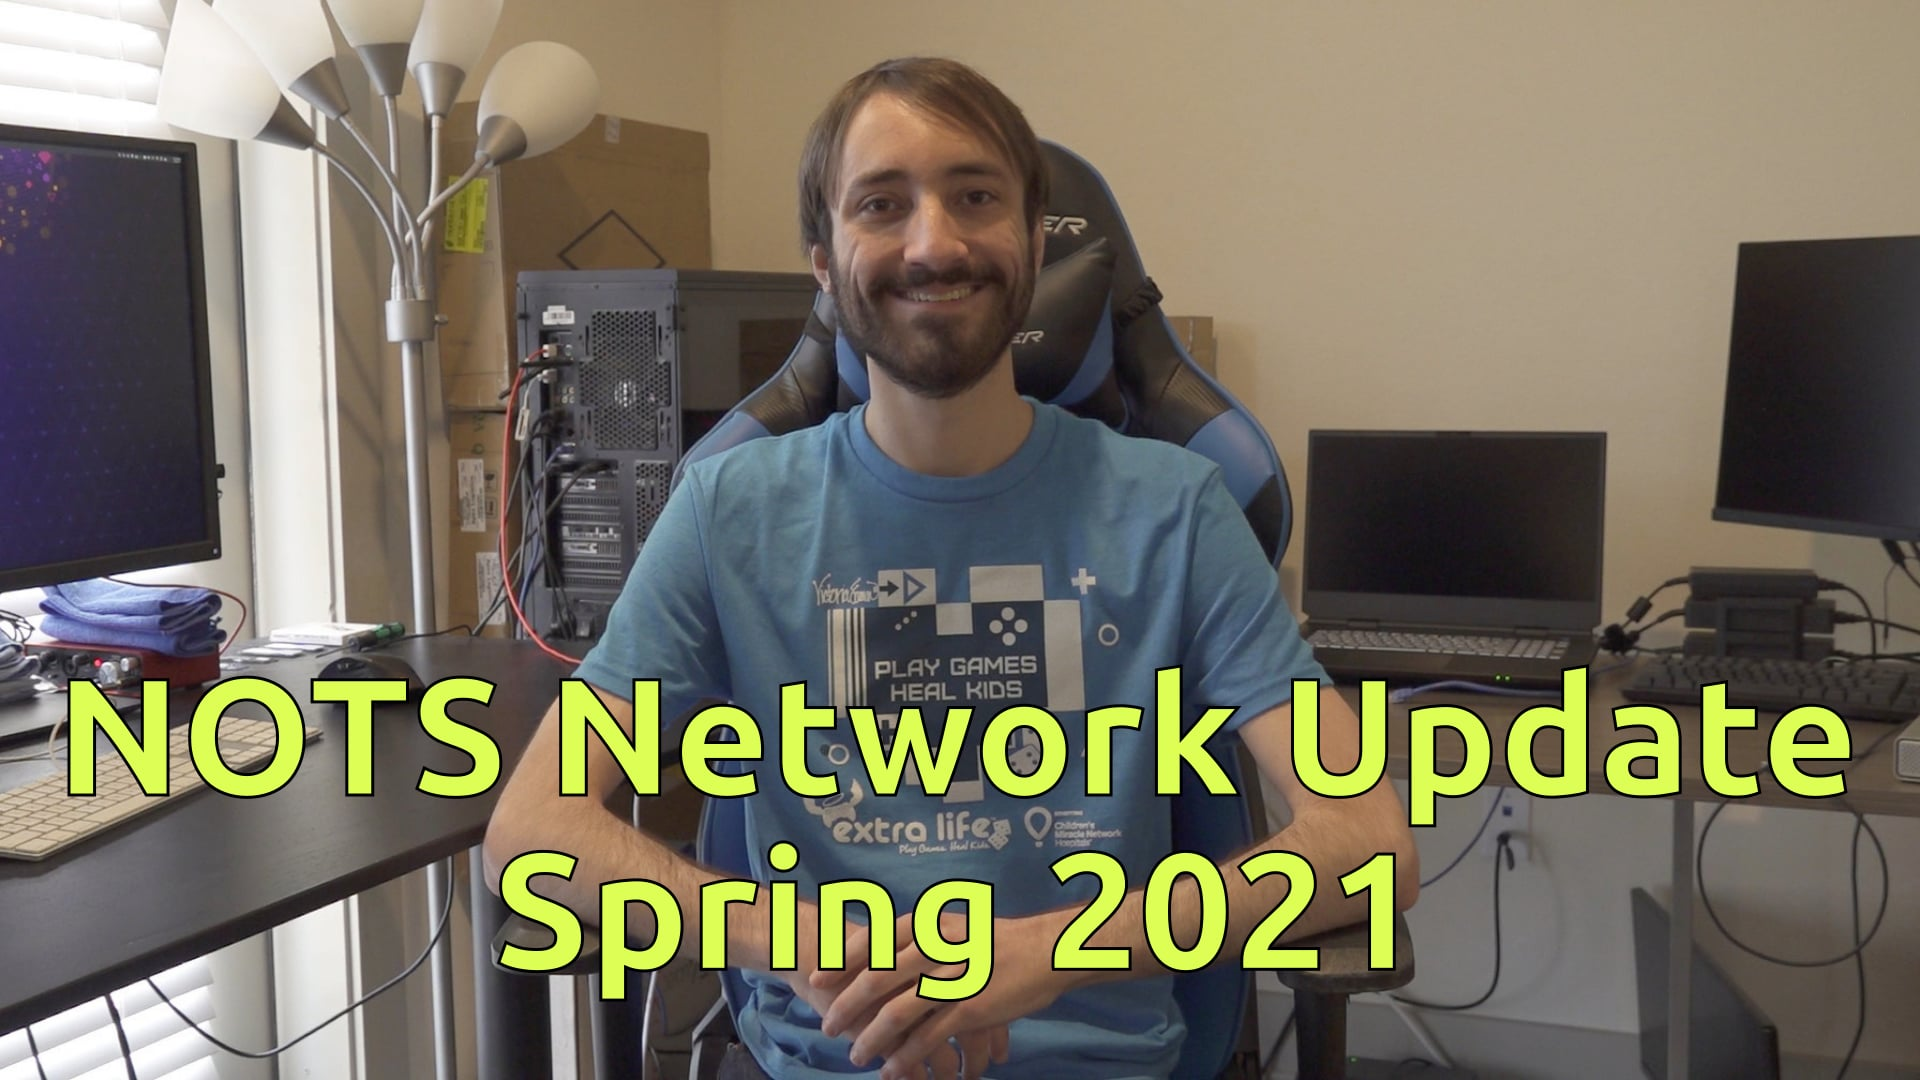 NOTS Network Update - Spring 2021